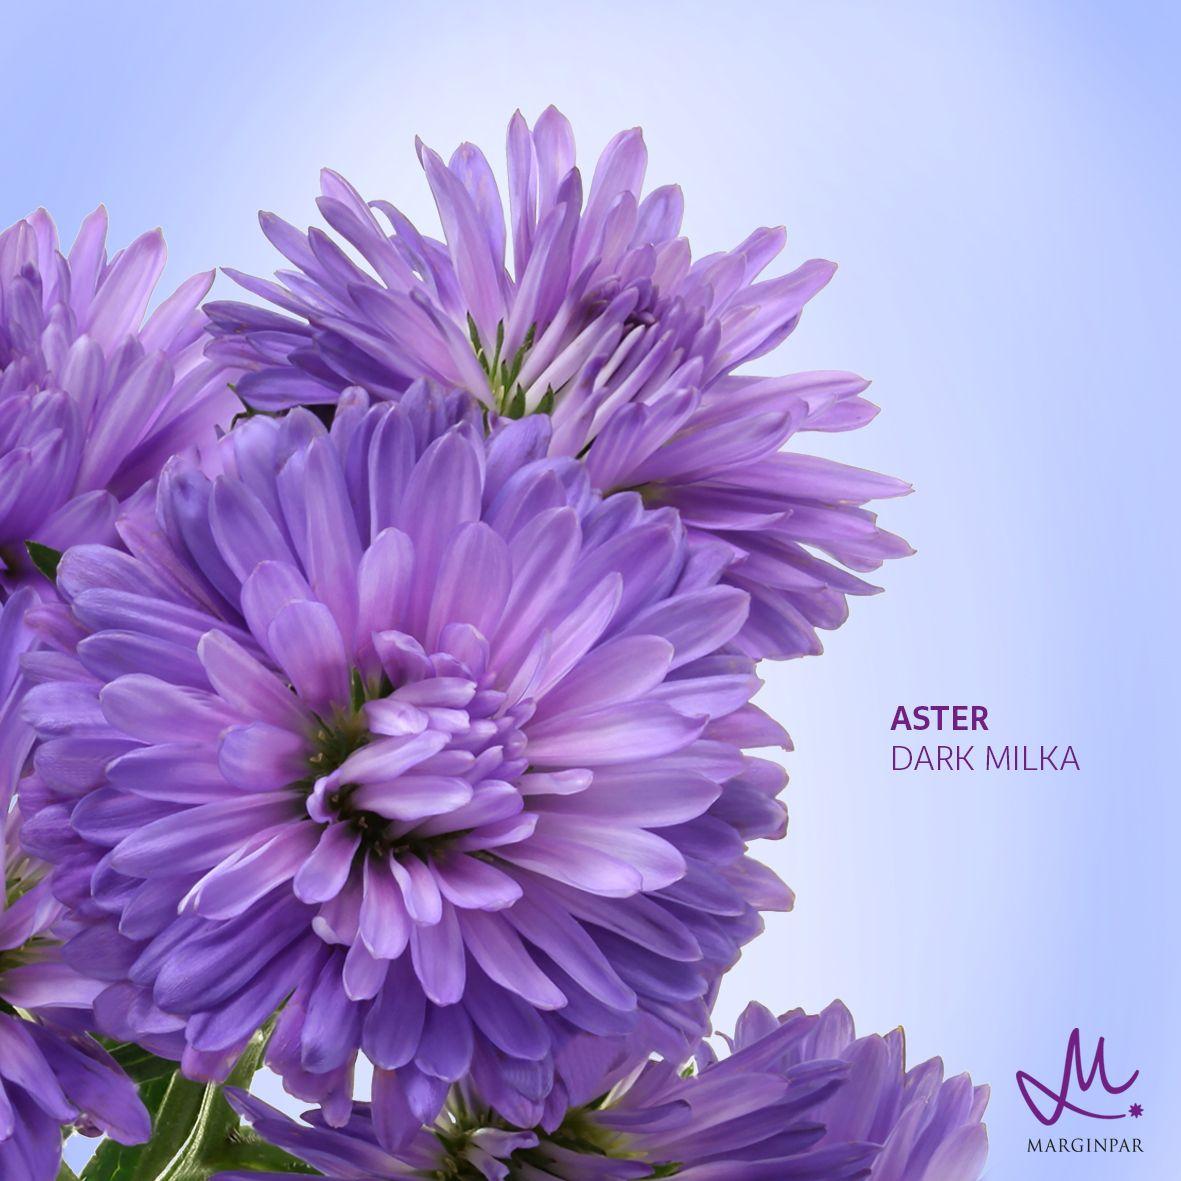 Aster Dark Milka In 2020 Ancient Greek Words Dark Milka